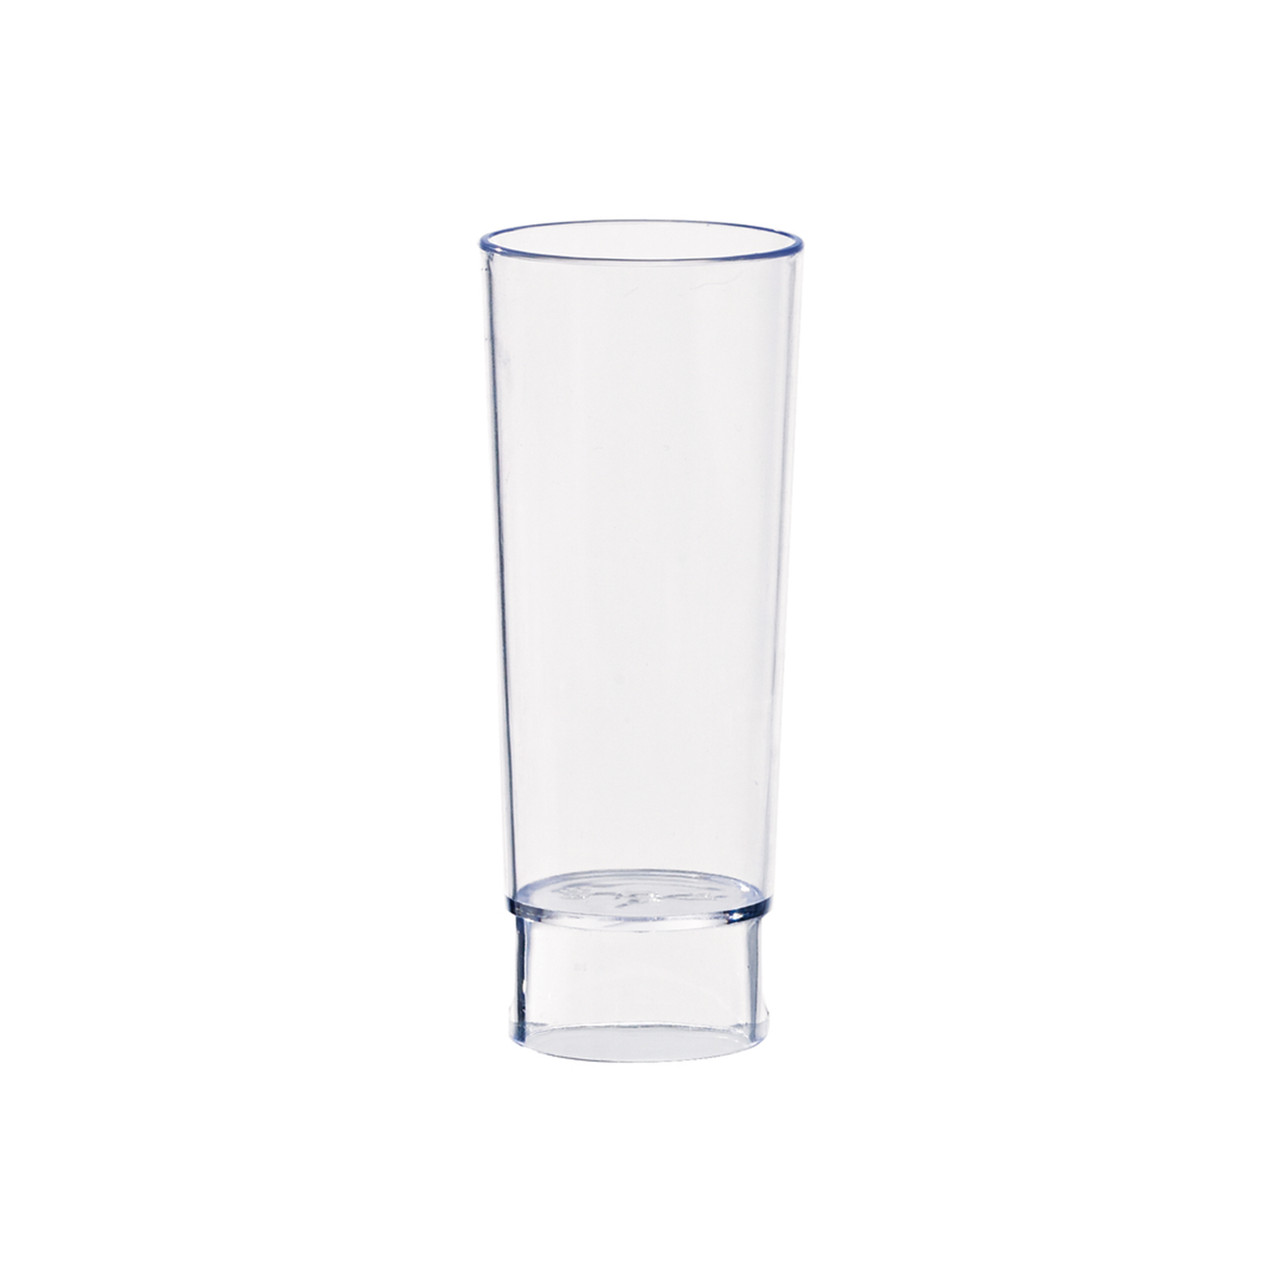 Tall Plastic Shot Glass -1.5oz Dia:1.45in H:3.6in